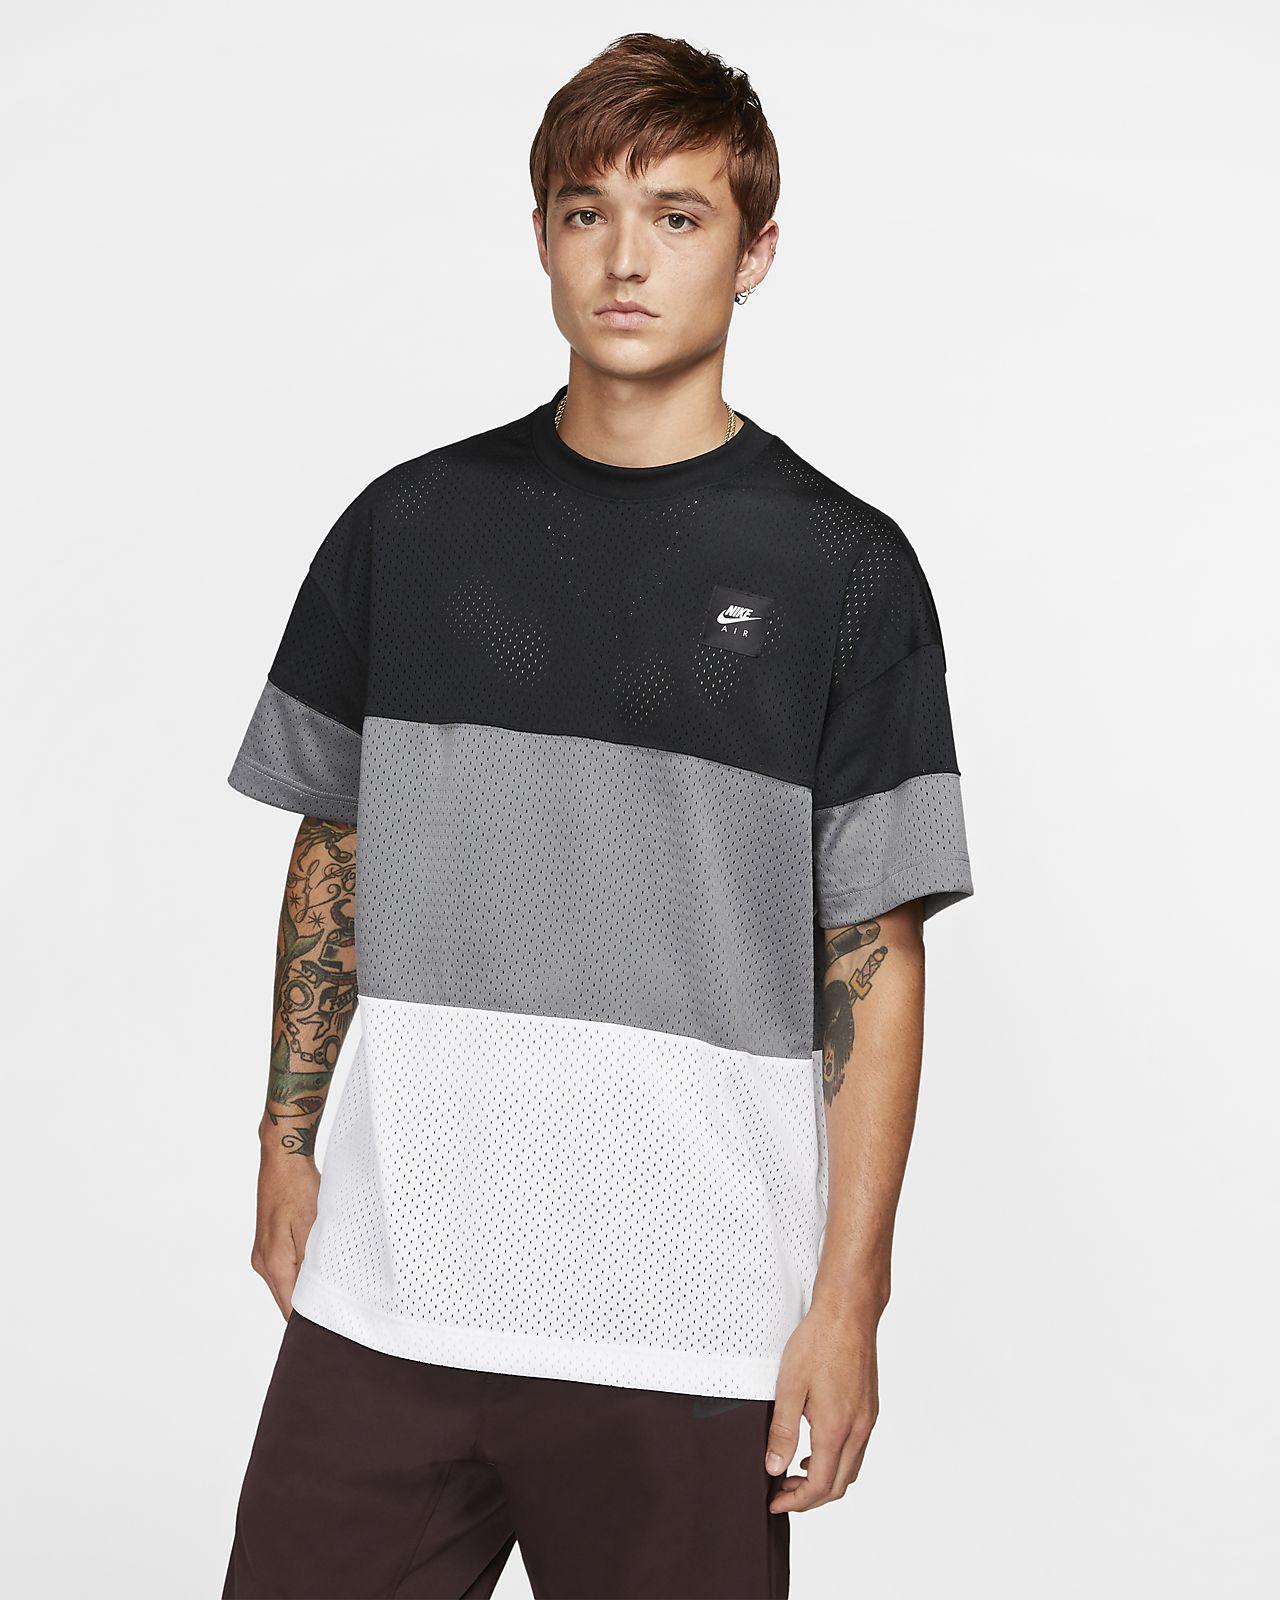 Kortärmad stickad tröja Nike Air för män